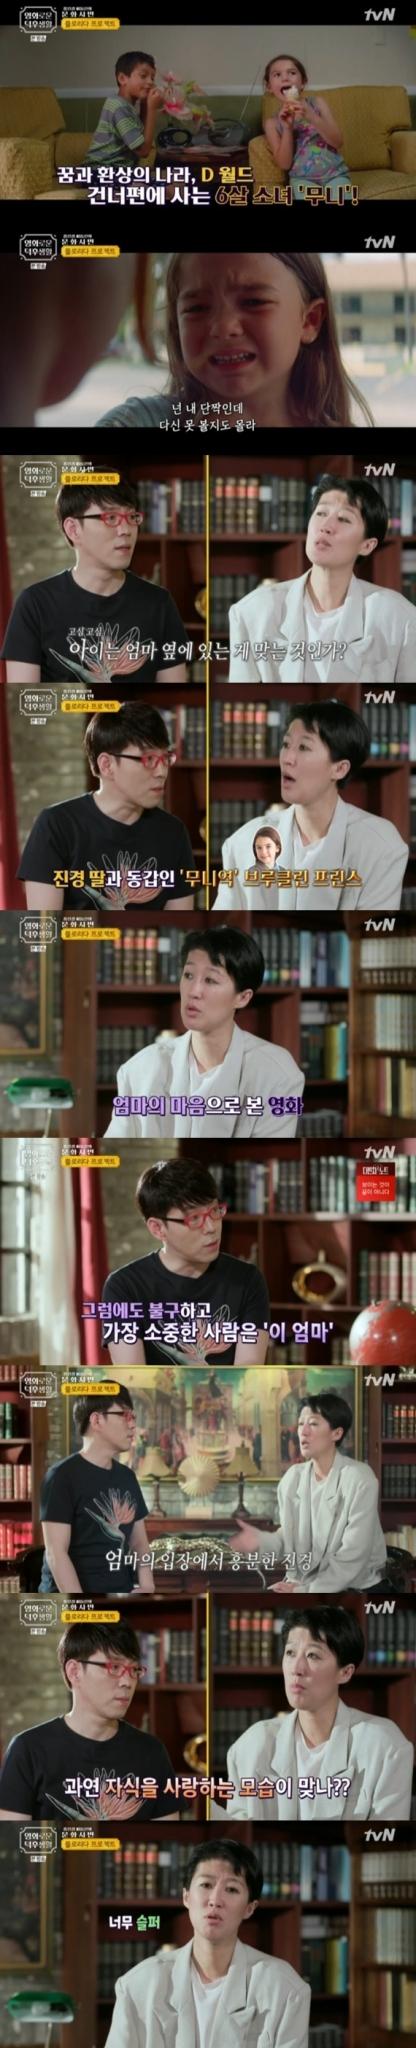 tvN '홍진경의 영화로운 덕후생활' © 뉴스1